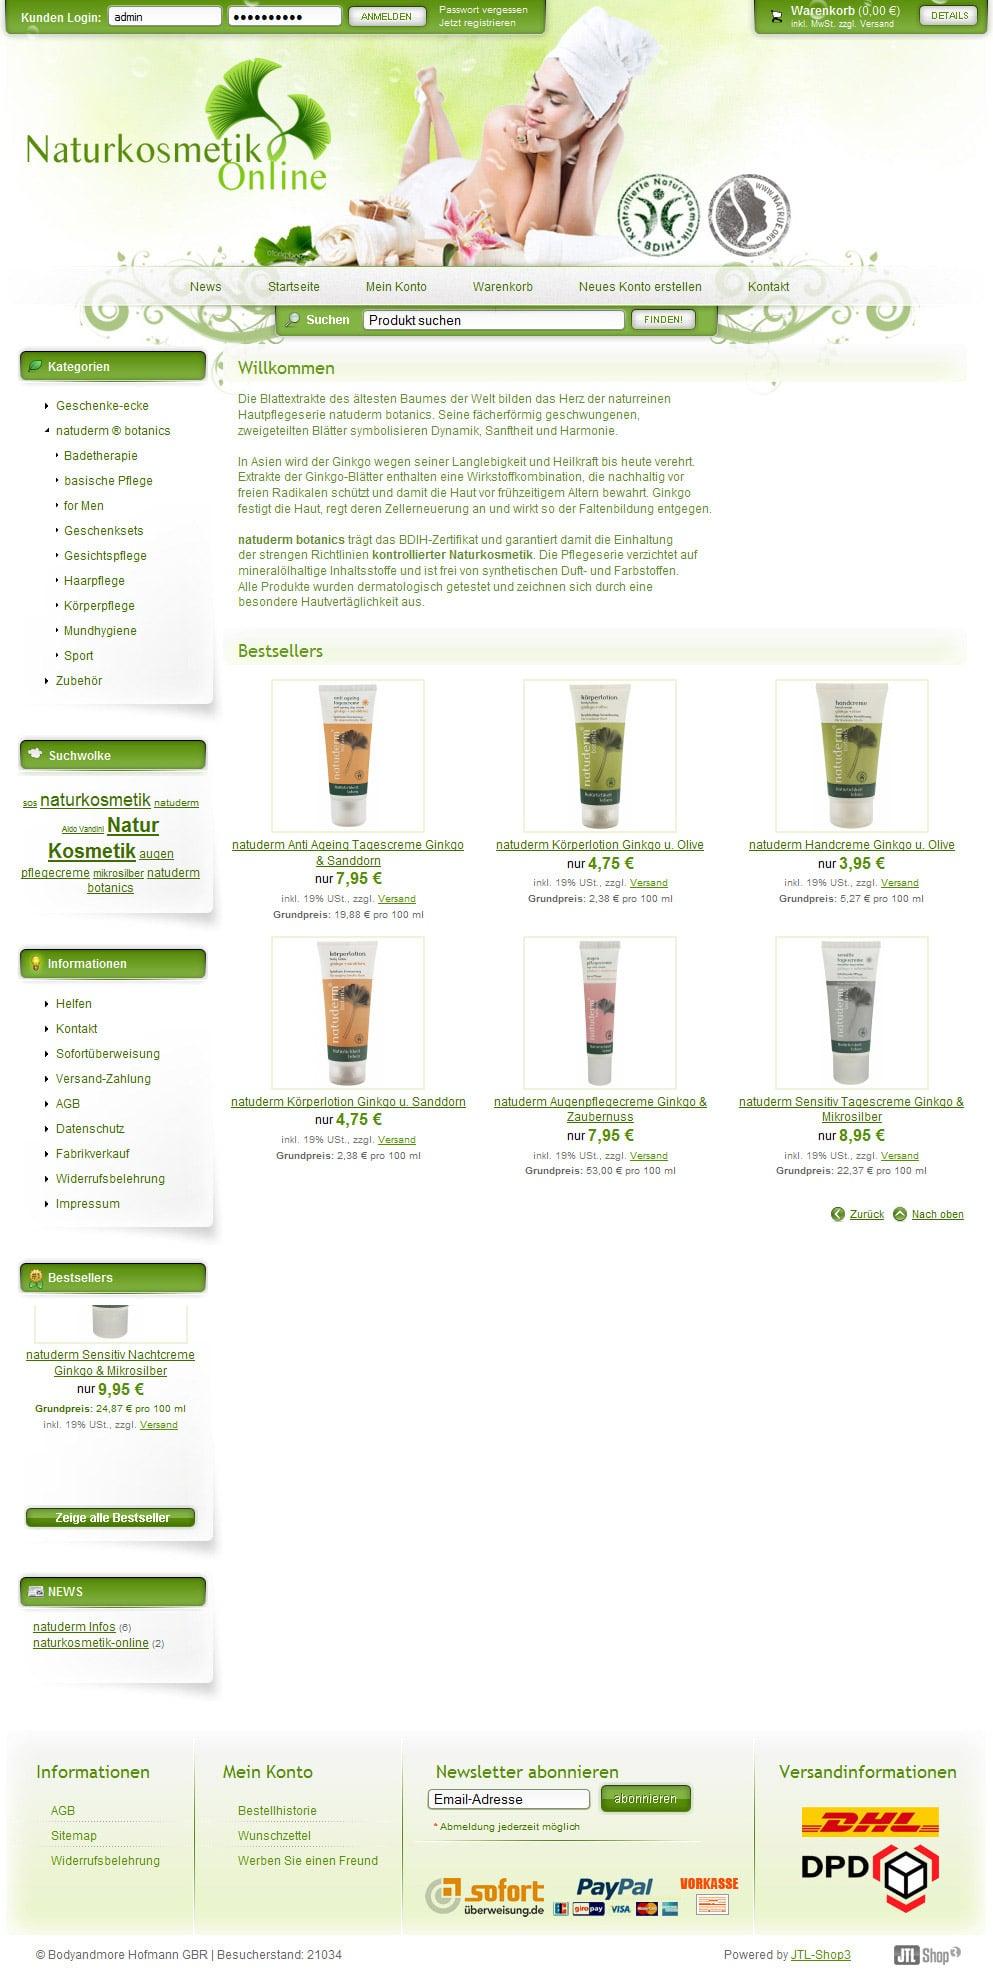 Naturkosmetik Online